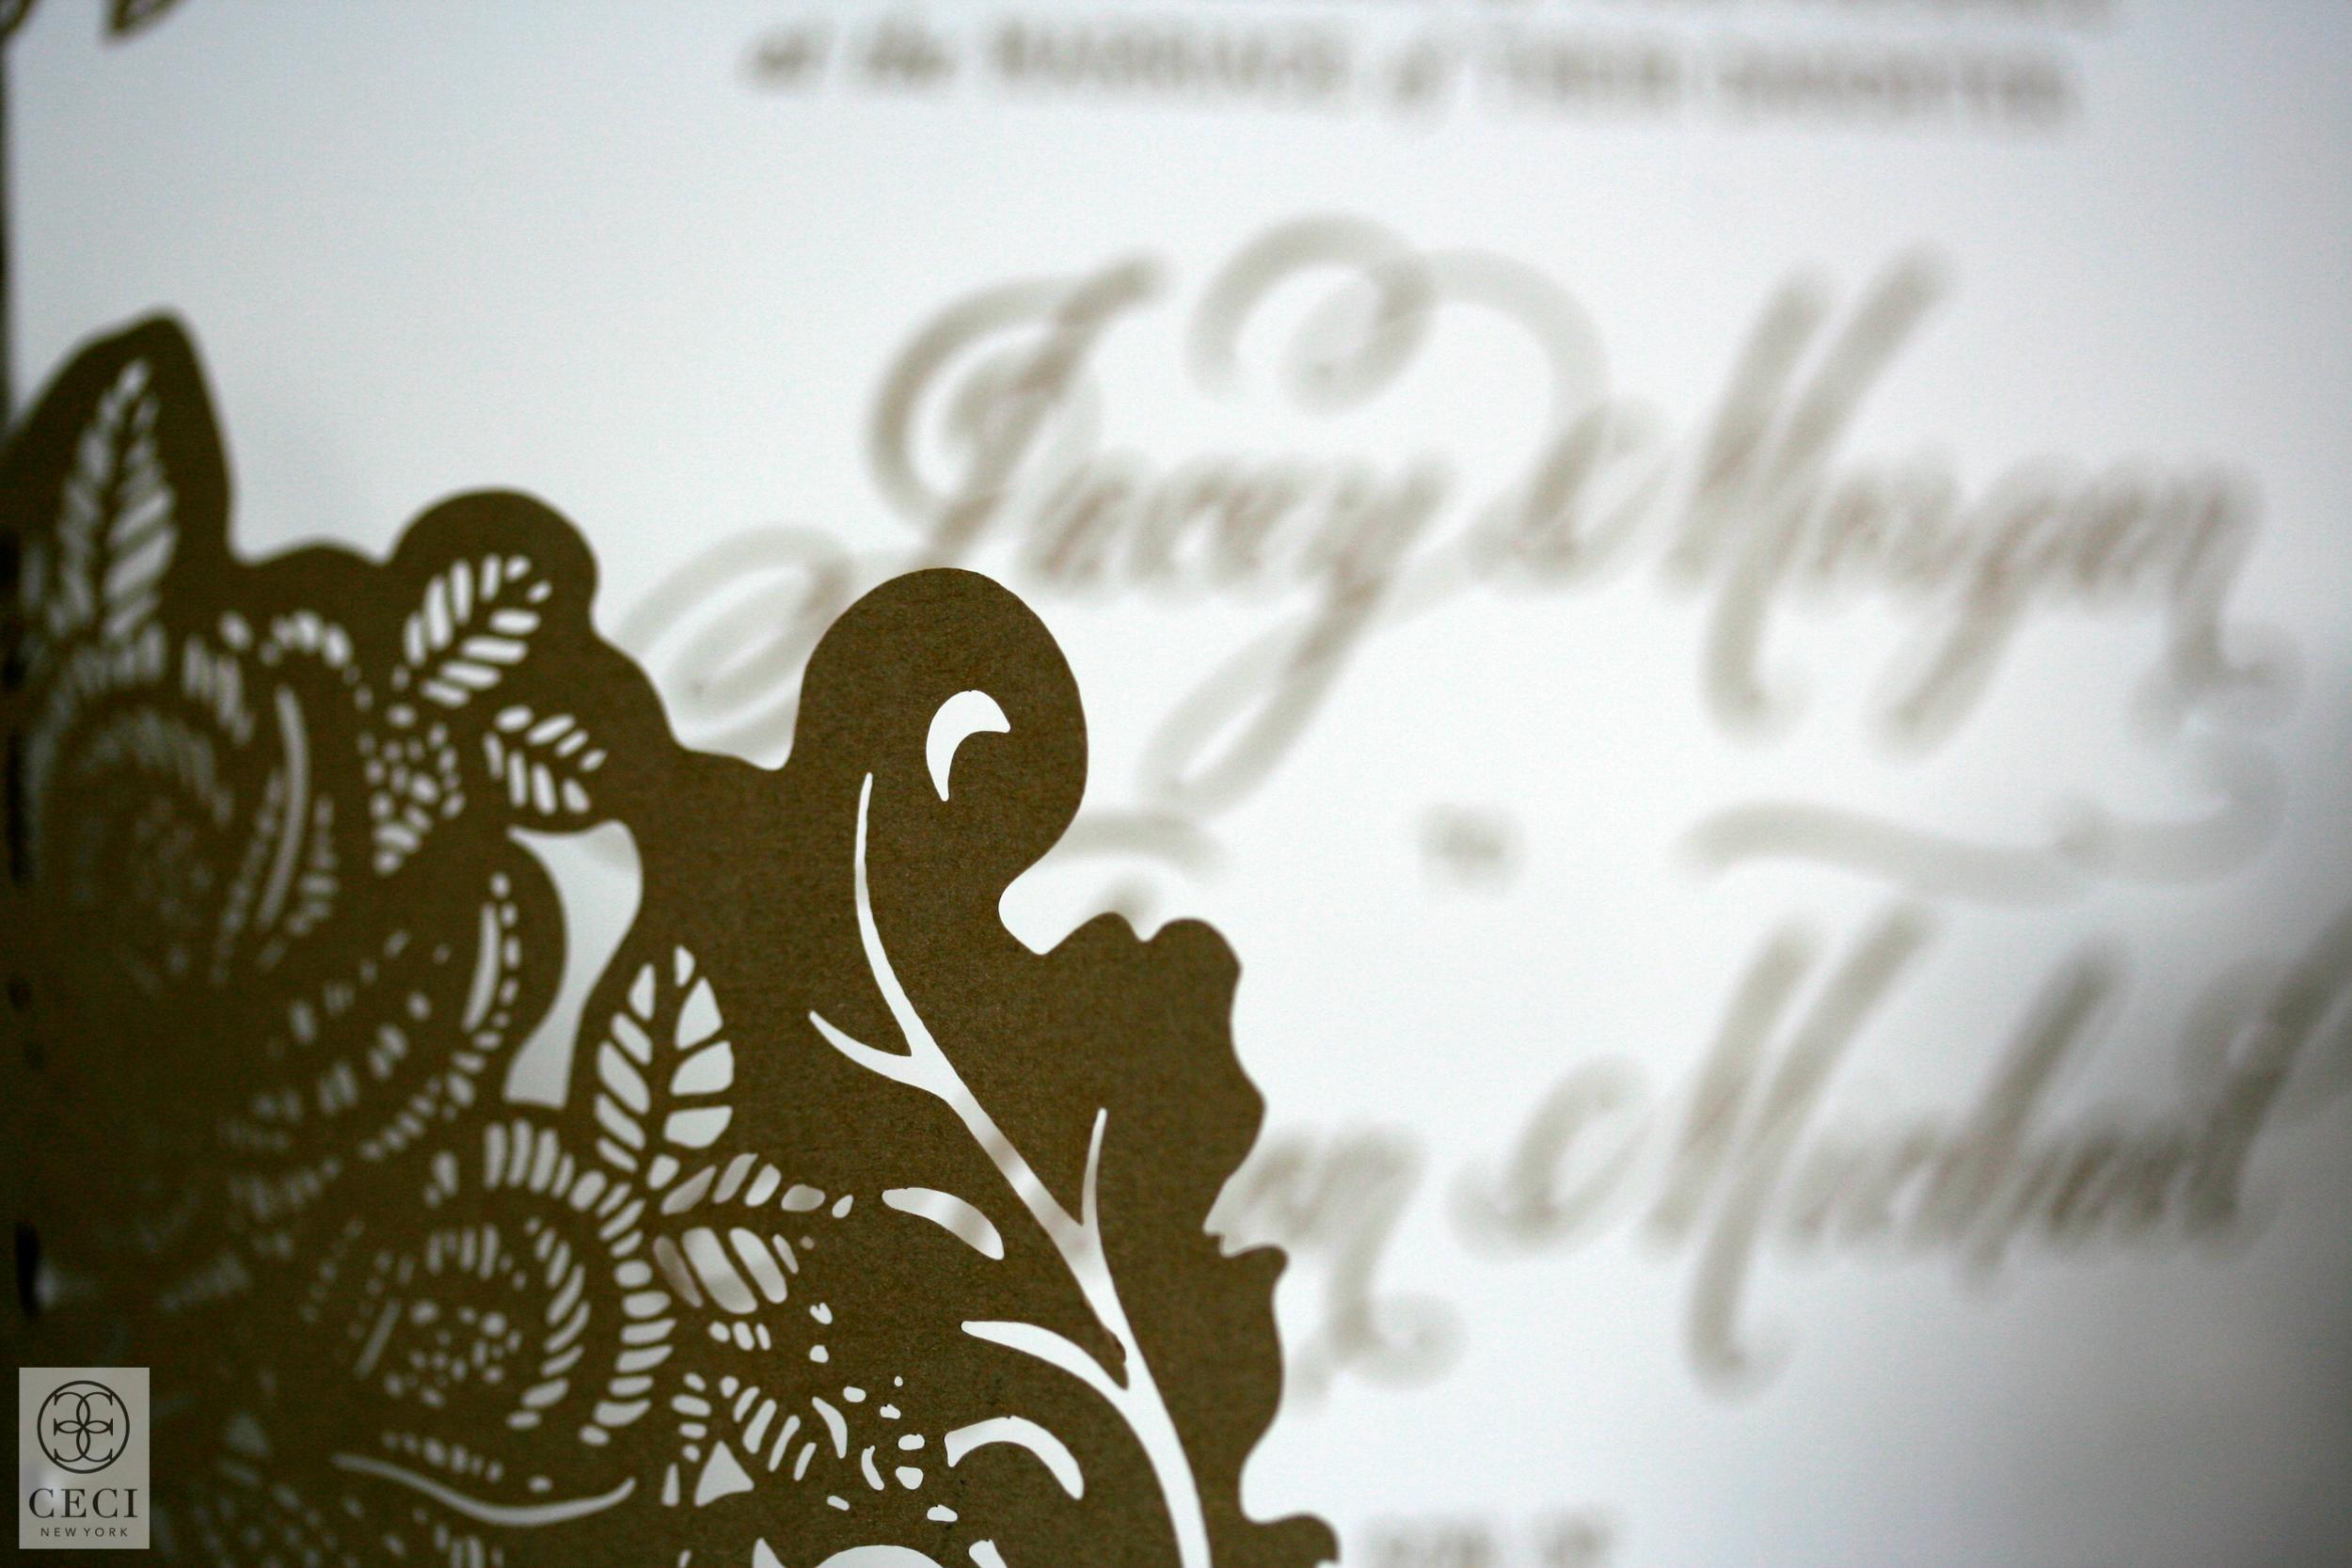 Ceci_New_York_Ceci_Style_Ceci_Johnson_Luxury_Lifestyle_Floral_Lace_Wedding_Letterpress_Inspiration_Design_Custom_Couture_Personalized_Invitations_-3.jpg